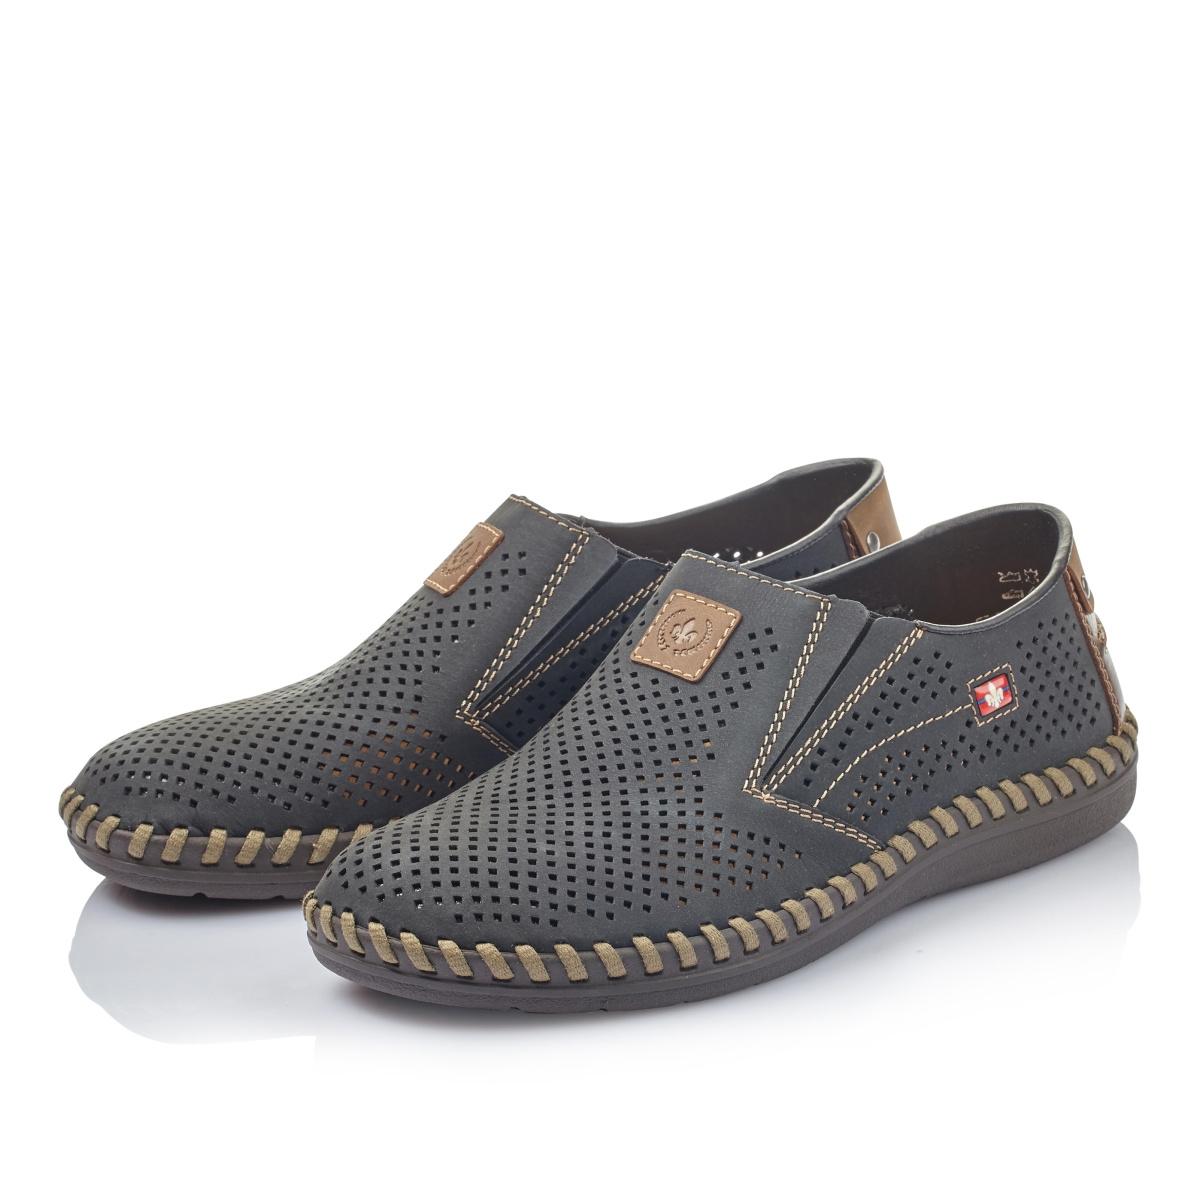 detail Pánska obuv RIEKER br B2455-14 BLAU ... fa6dcecd165